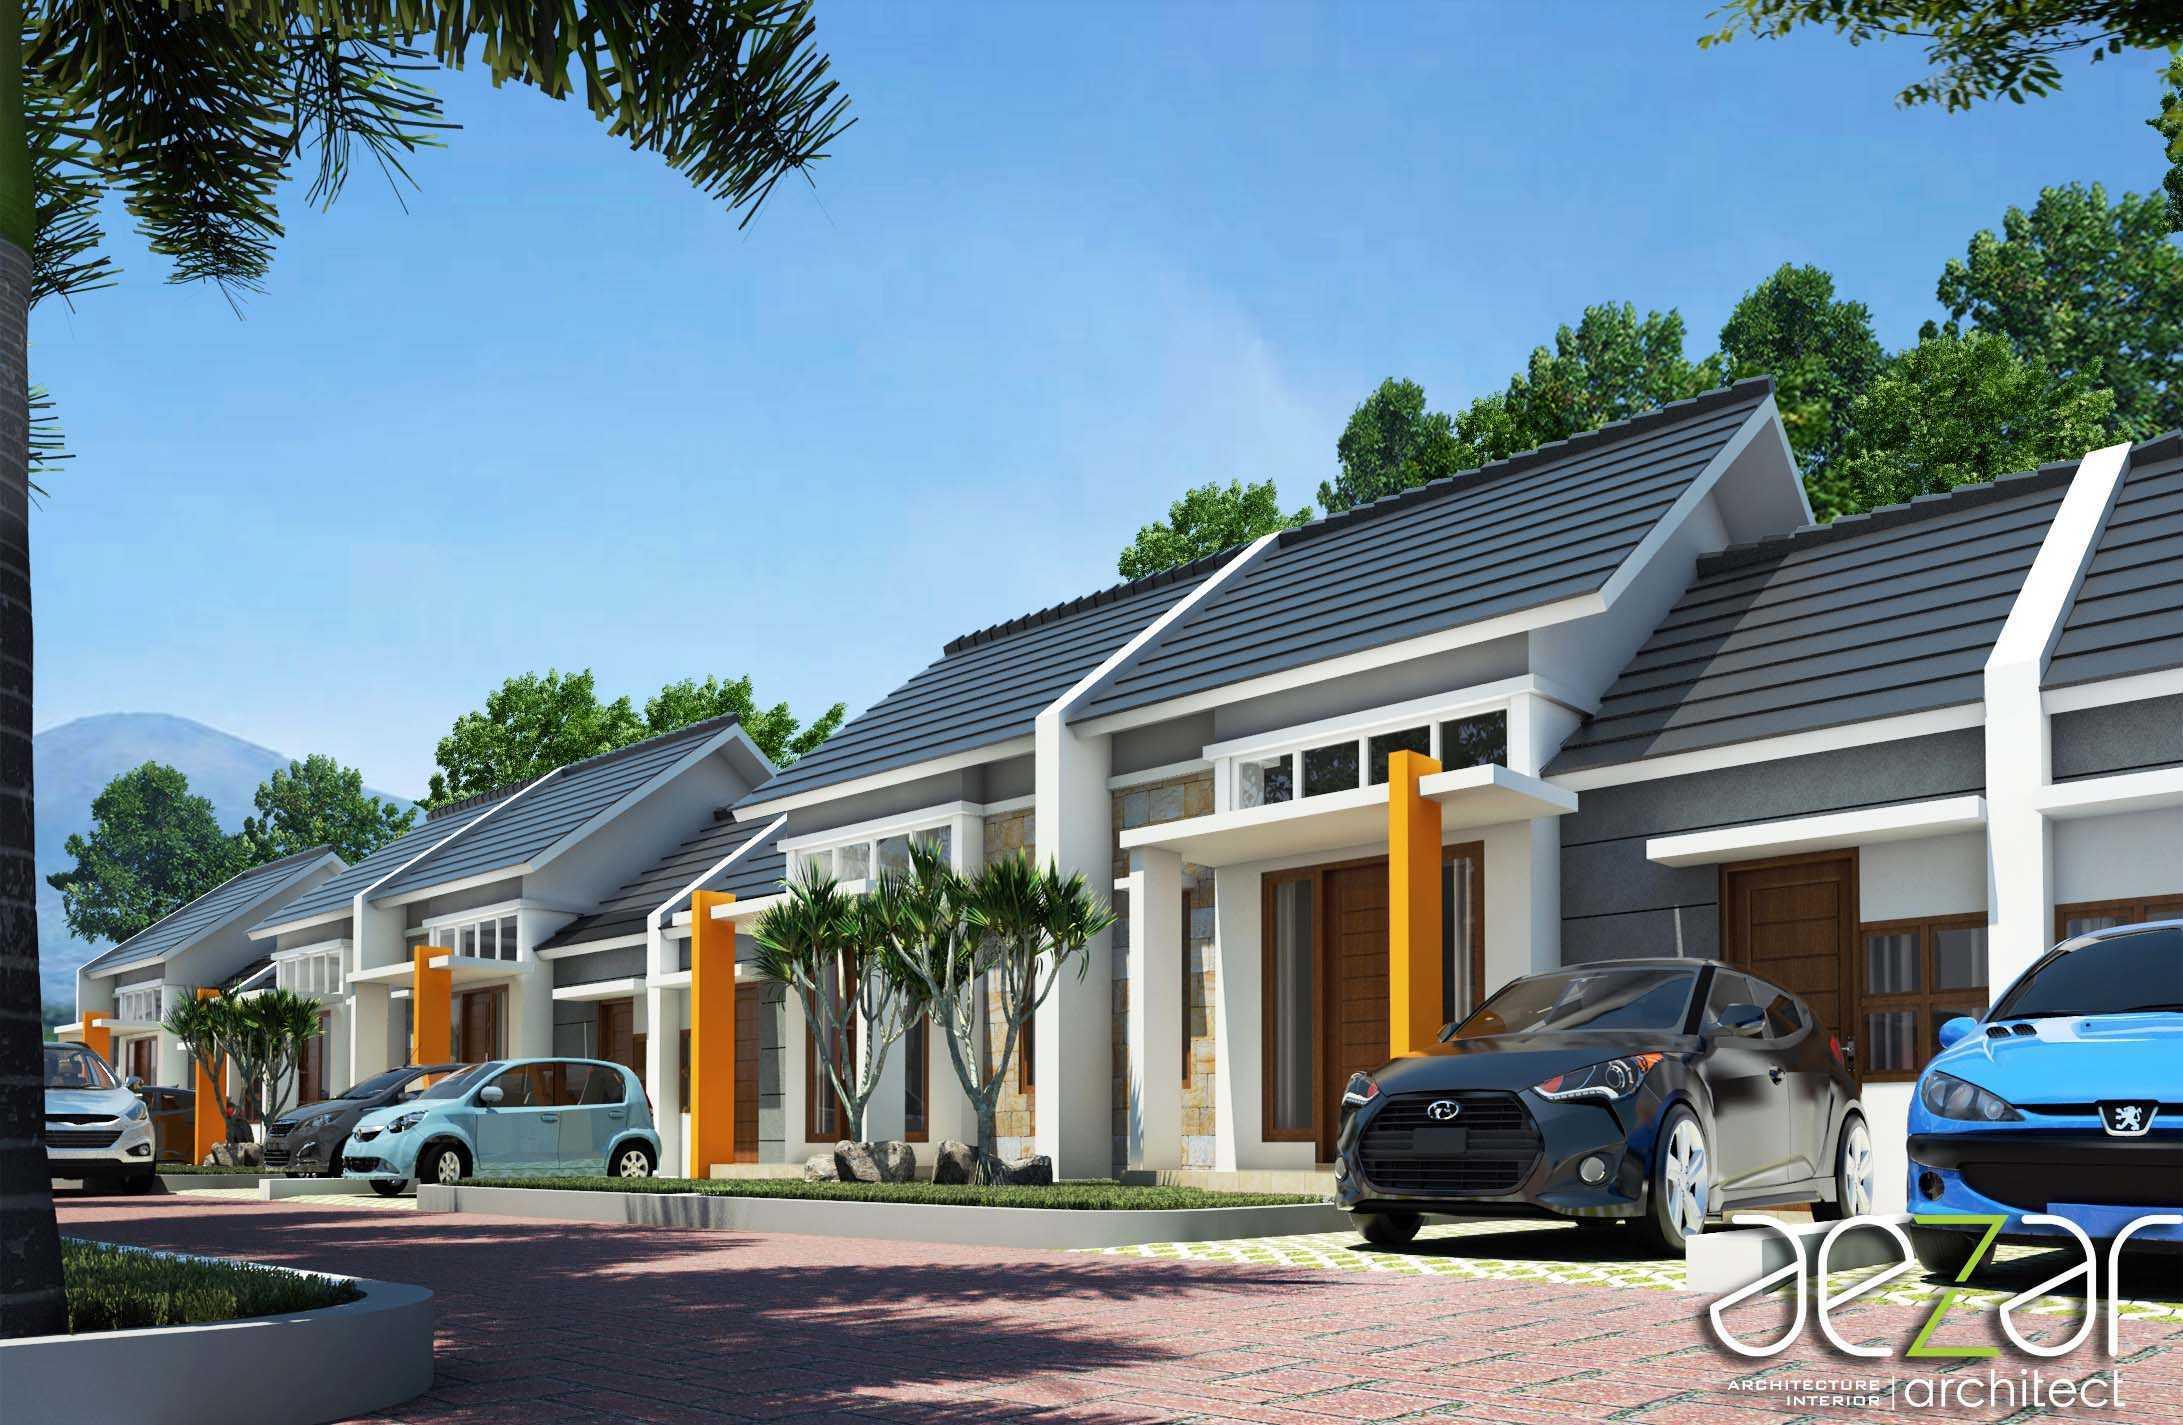 Aezar Architect Perumahan Grand Muktiwari Regency Bekasi, Tambelang, Bekasi, Jawa Barat, Indonesia Bekasi, Tambelang, Bekasi, Jawa Barat, Indonesia Exterior View Minimalis 54449